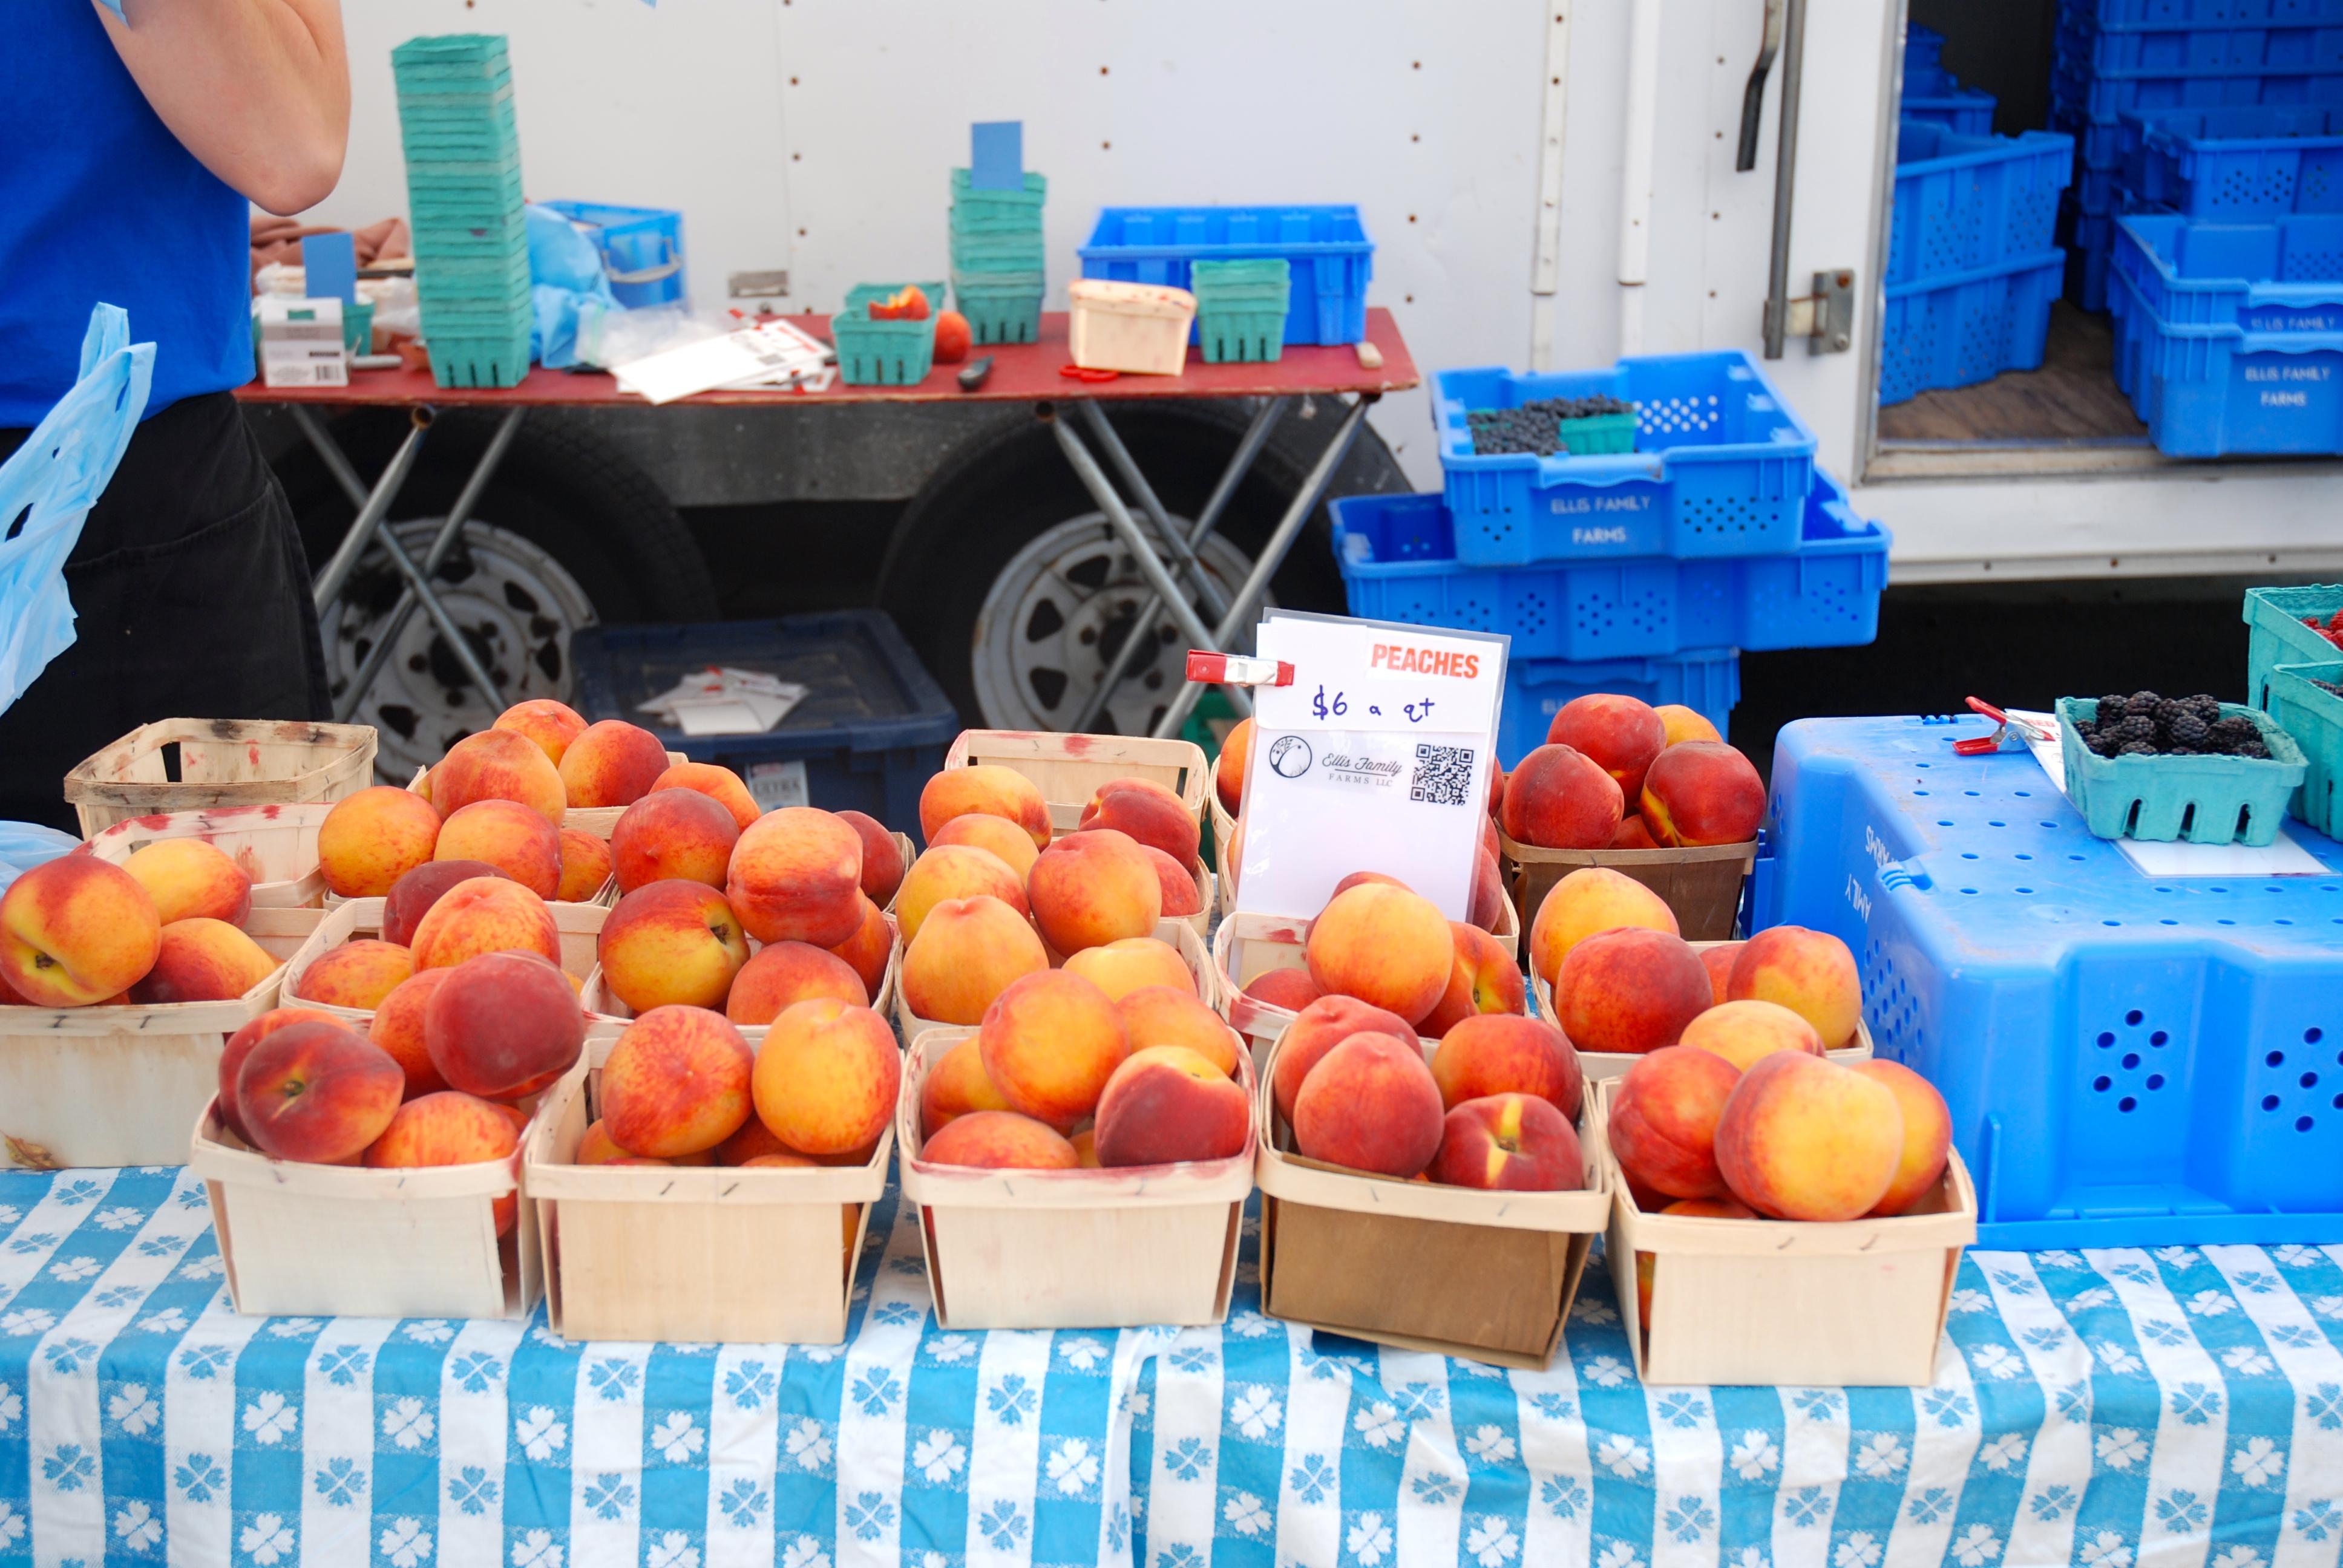 Division Street Farmer's Market